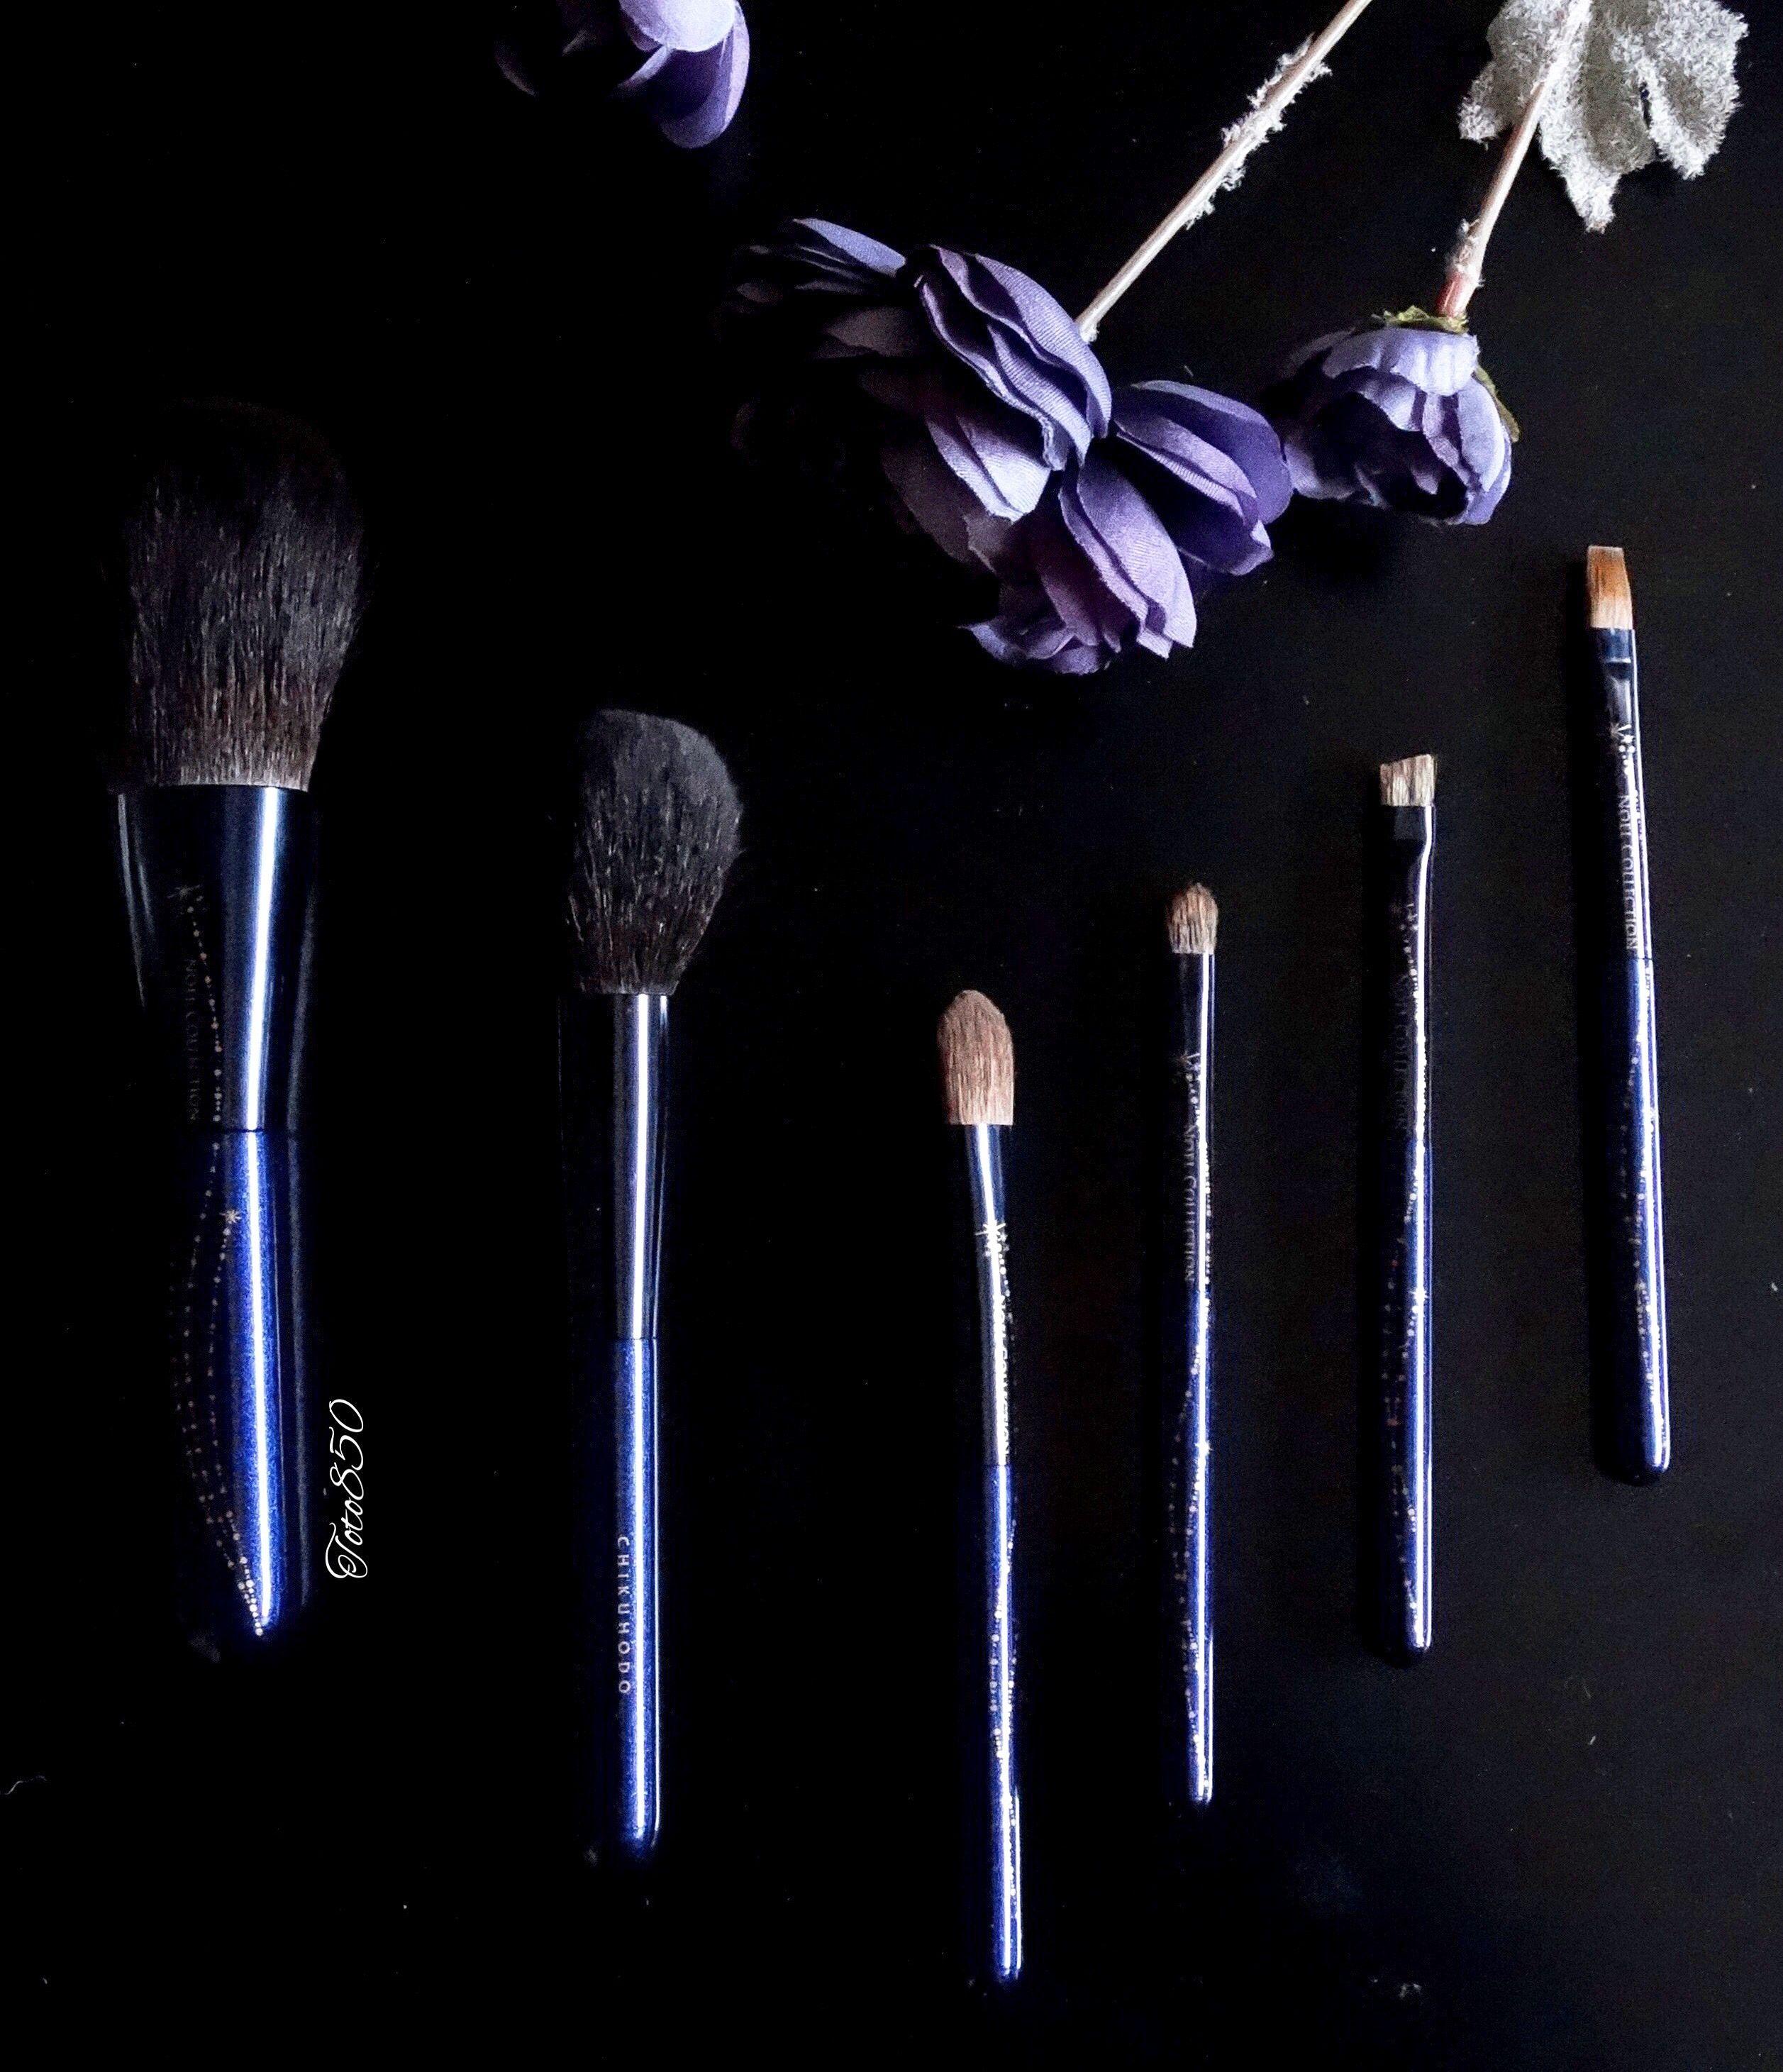 Pin by Davida Spencer on Japanese makeup brushes